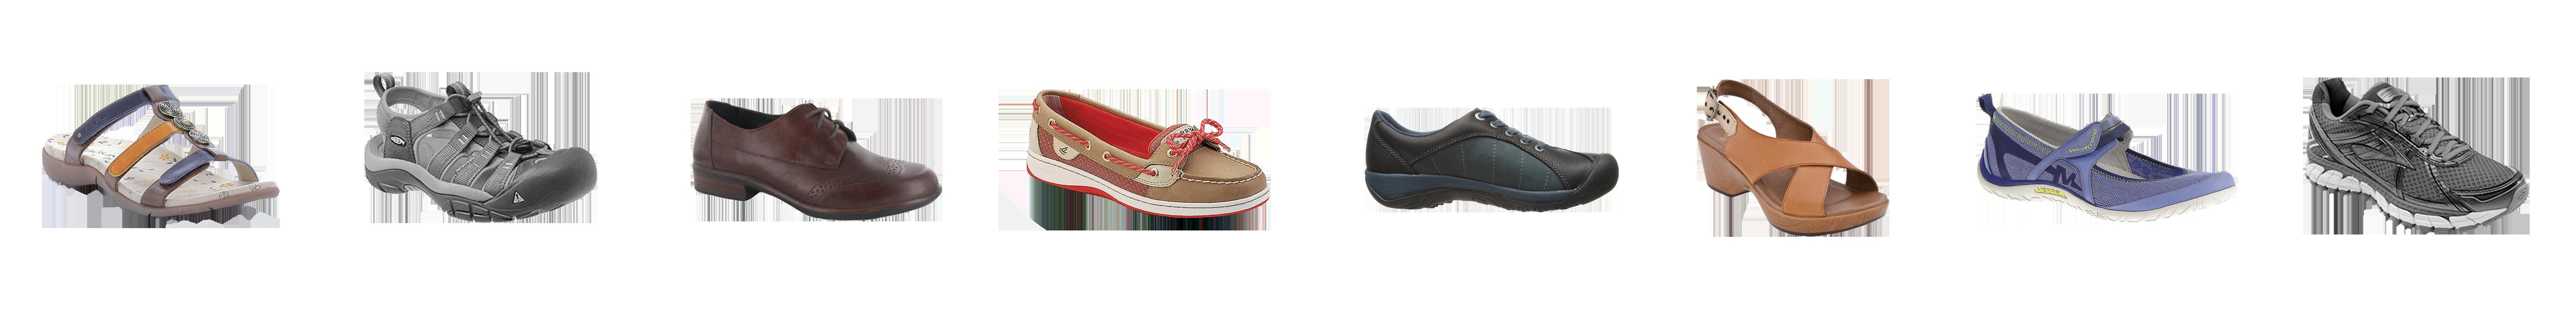 getcity leather shoes spirit flats pg comfort punter walking comfortable doctor ballet athletic comforter for pz easy